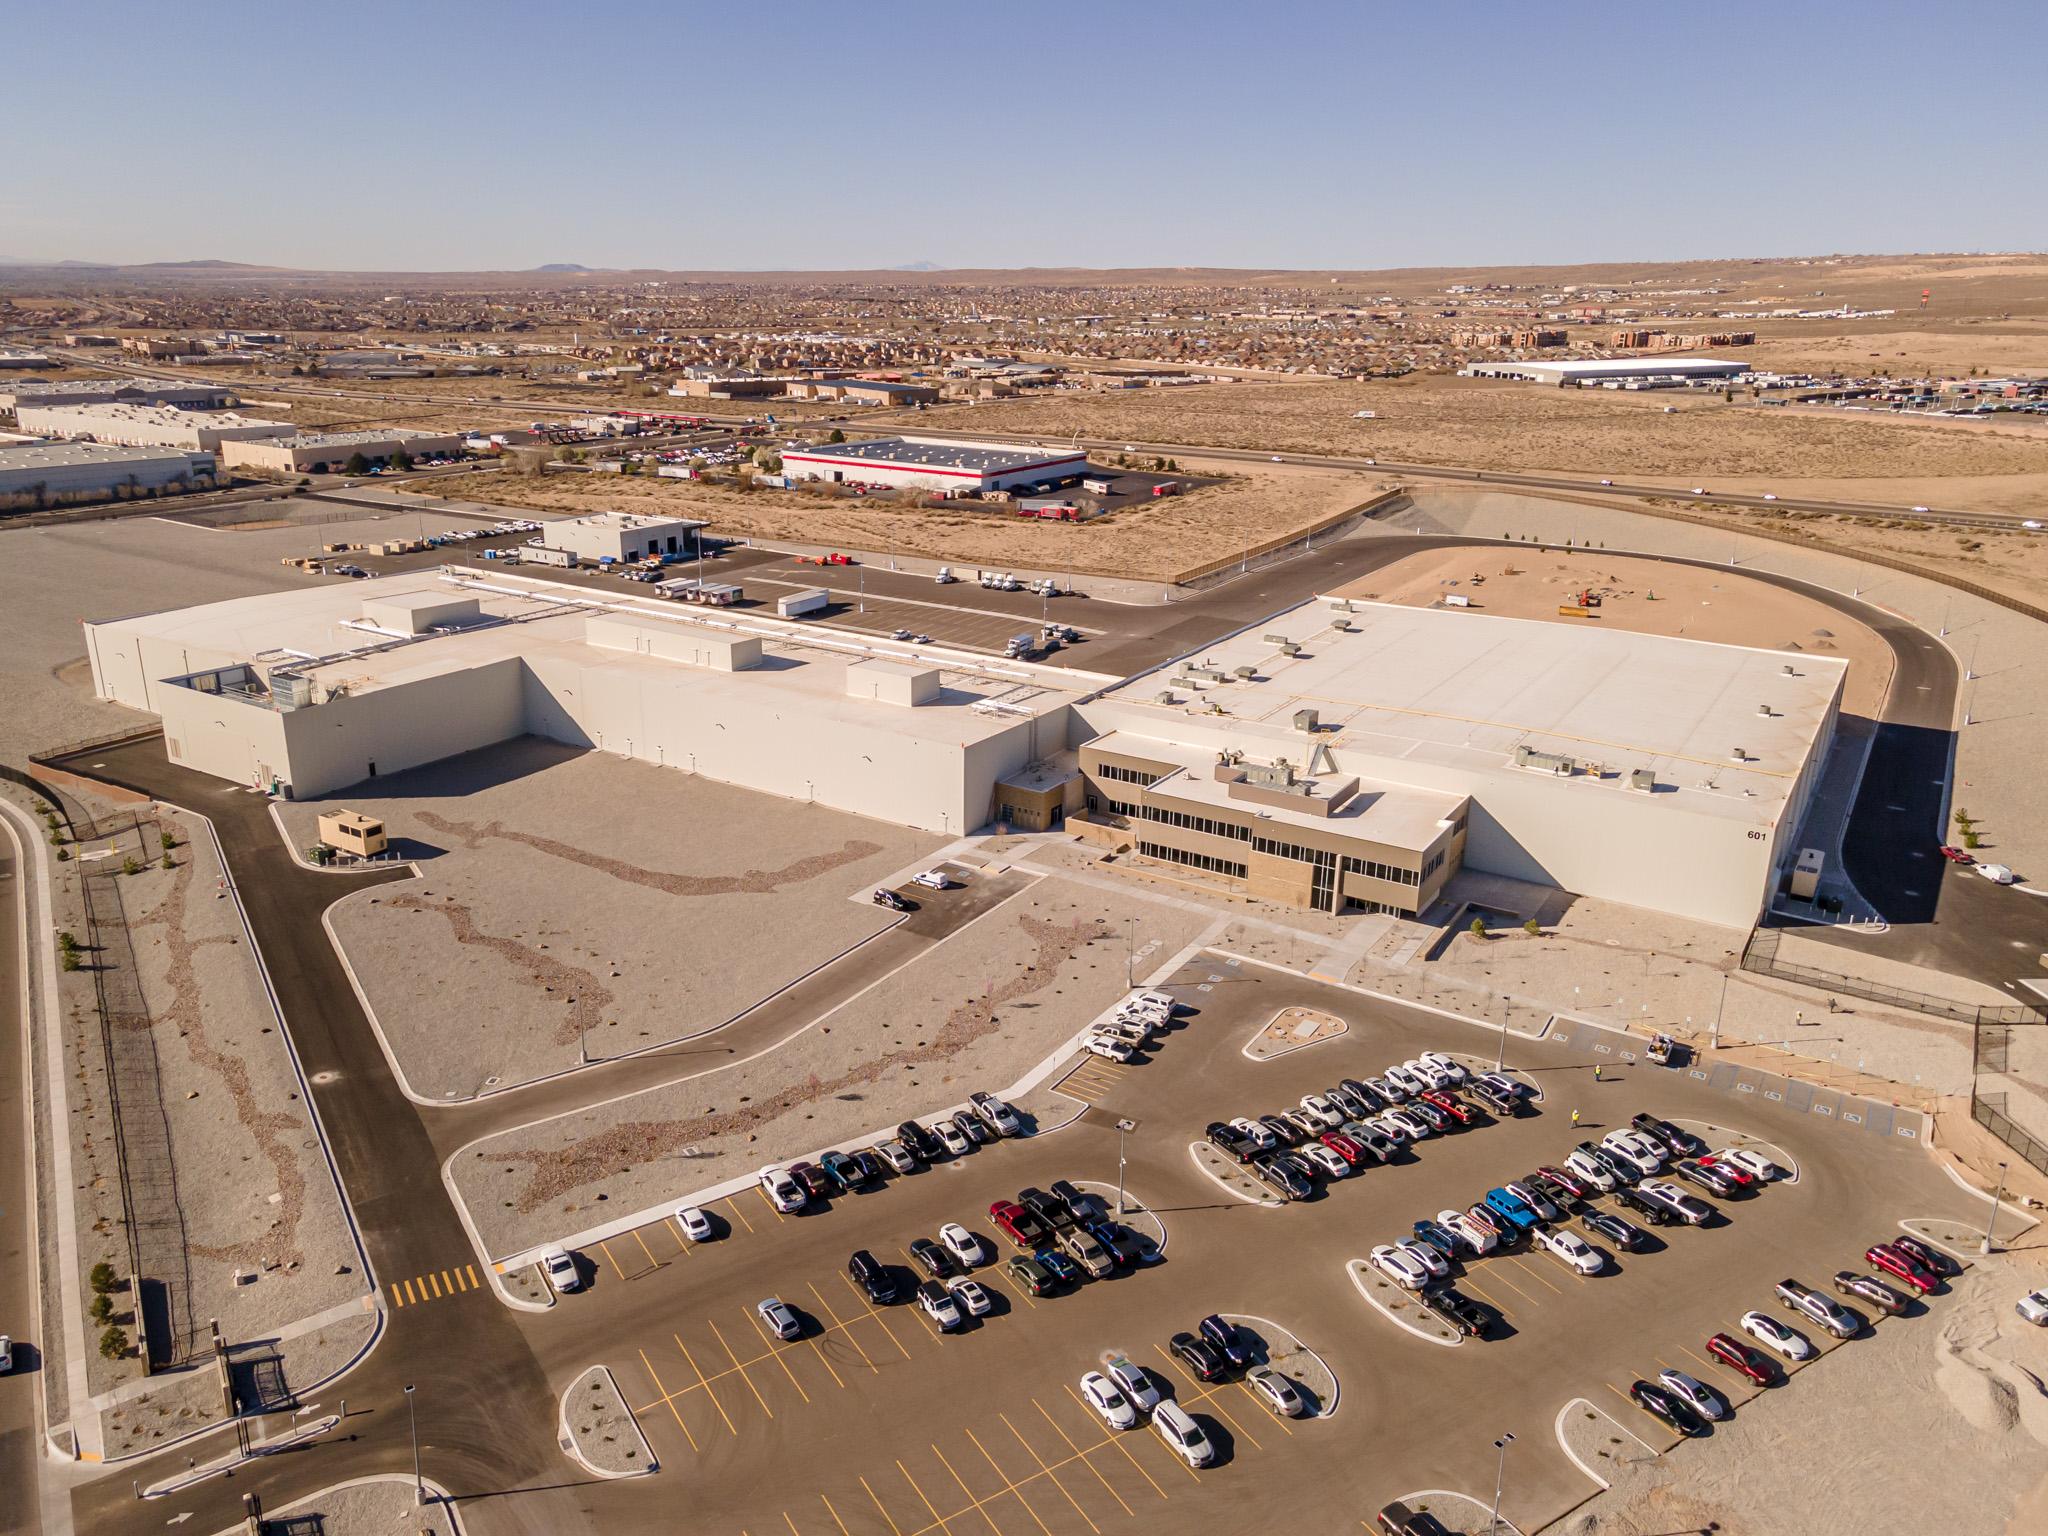 Food Distribution Center in Albuquerque, New Mexico